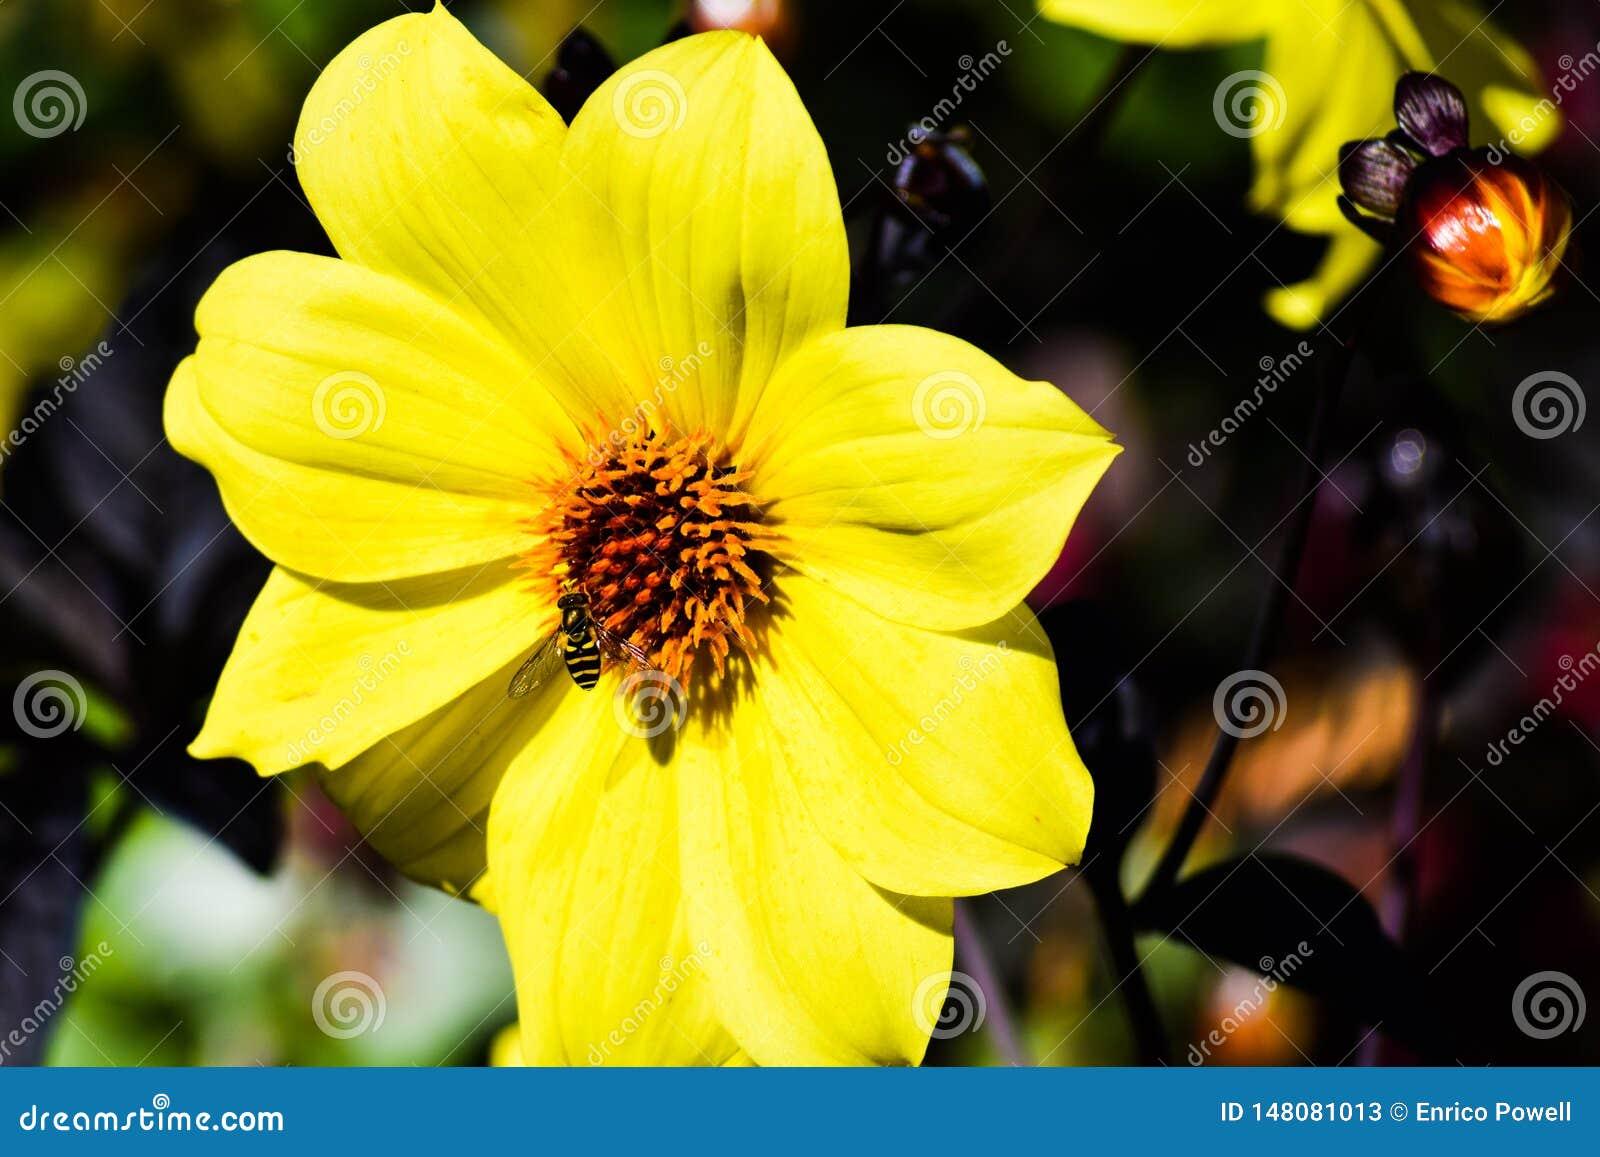 Bee/Bumblebee feeding on pollen from bright yellow daisy/ sunflower.